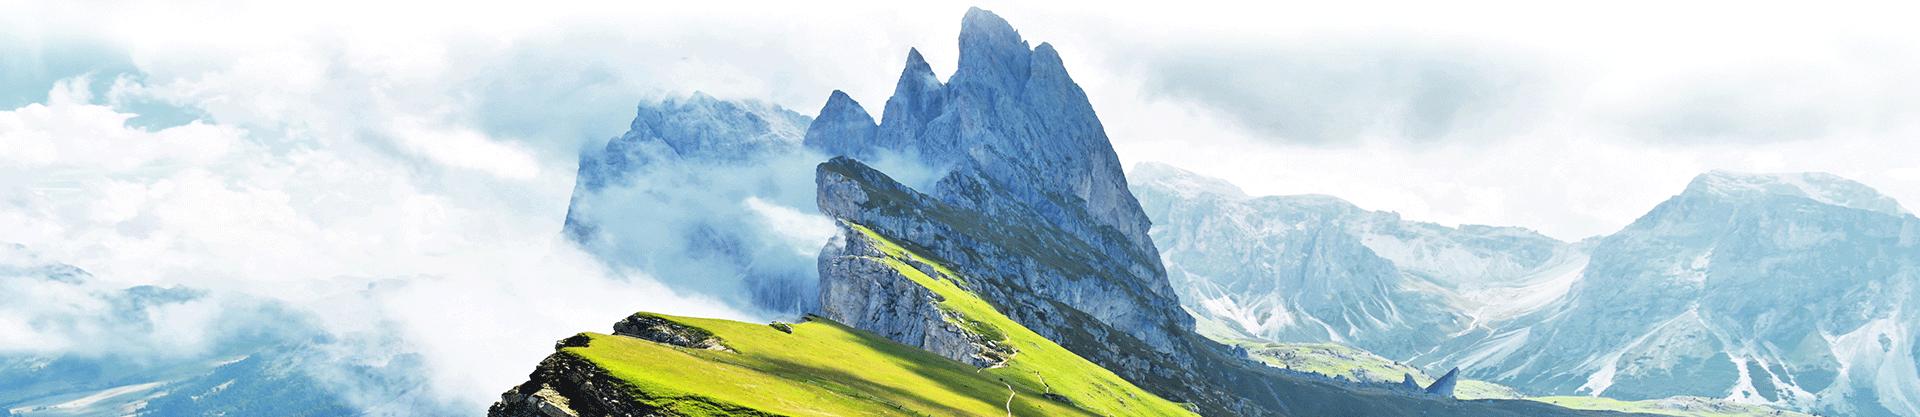 Home-Slider-Mountain